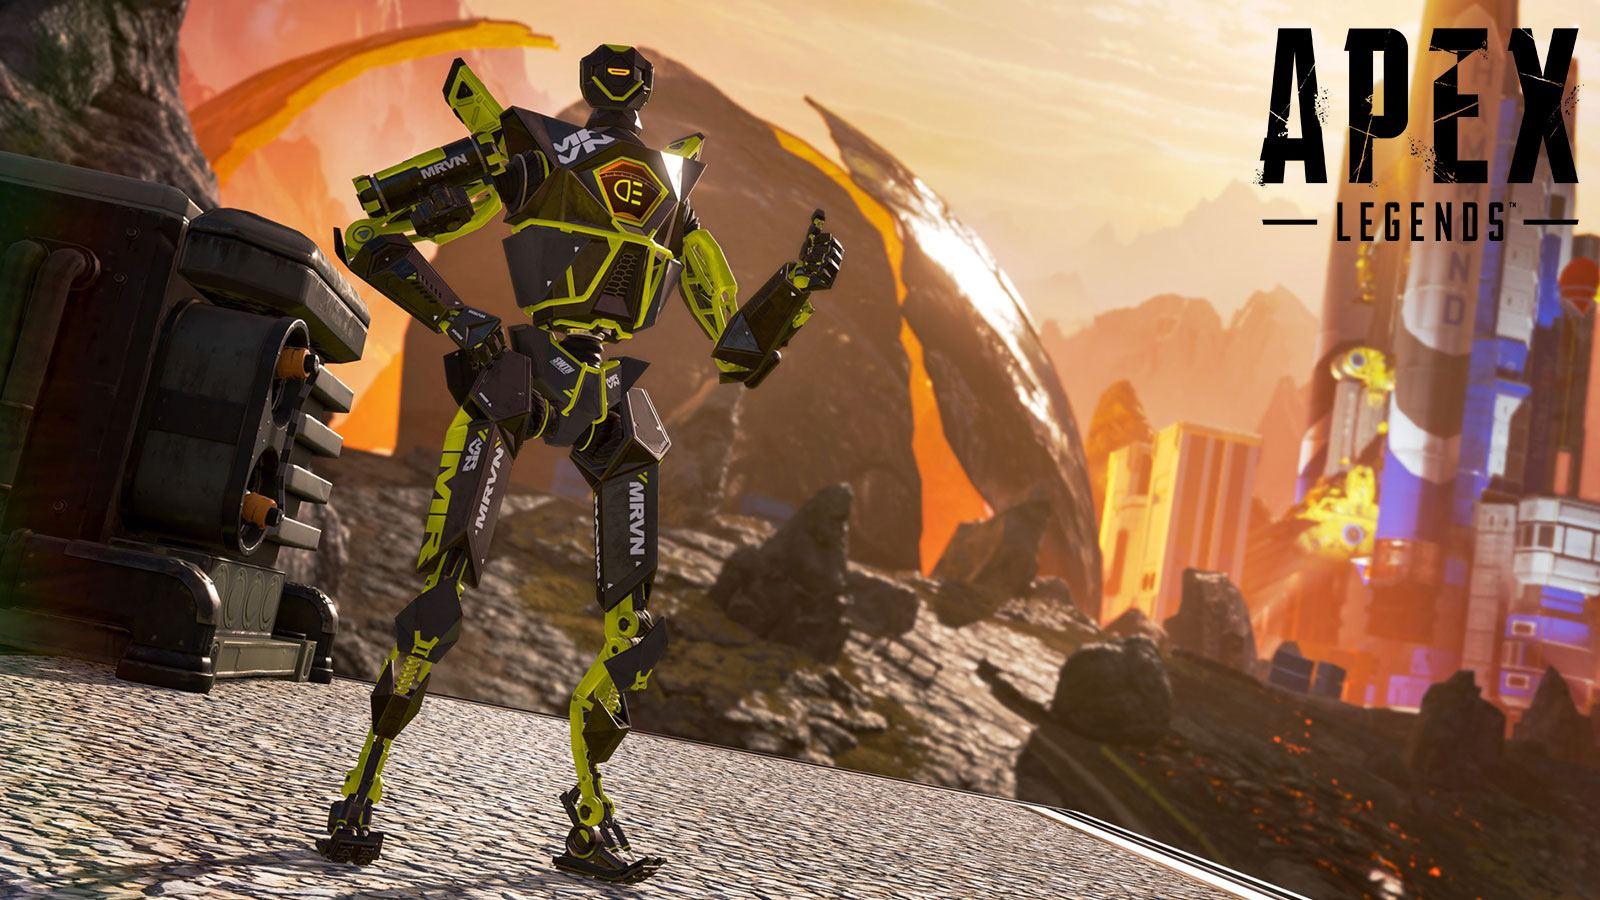 Patch Pathfinder Apex Legends thumbs up Respawn Entertainment